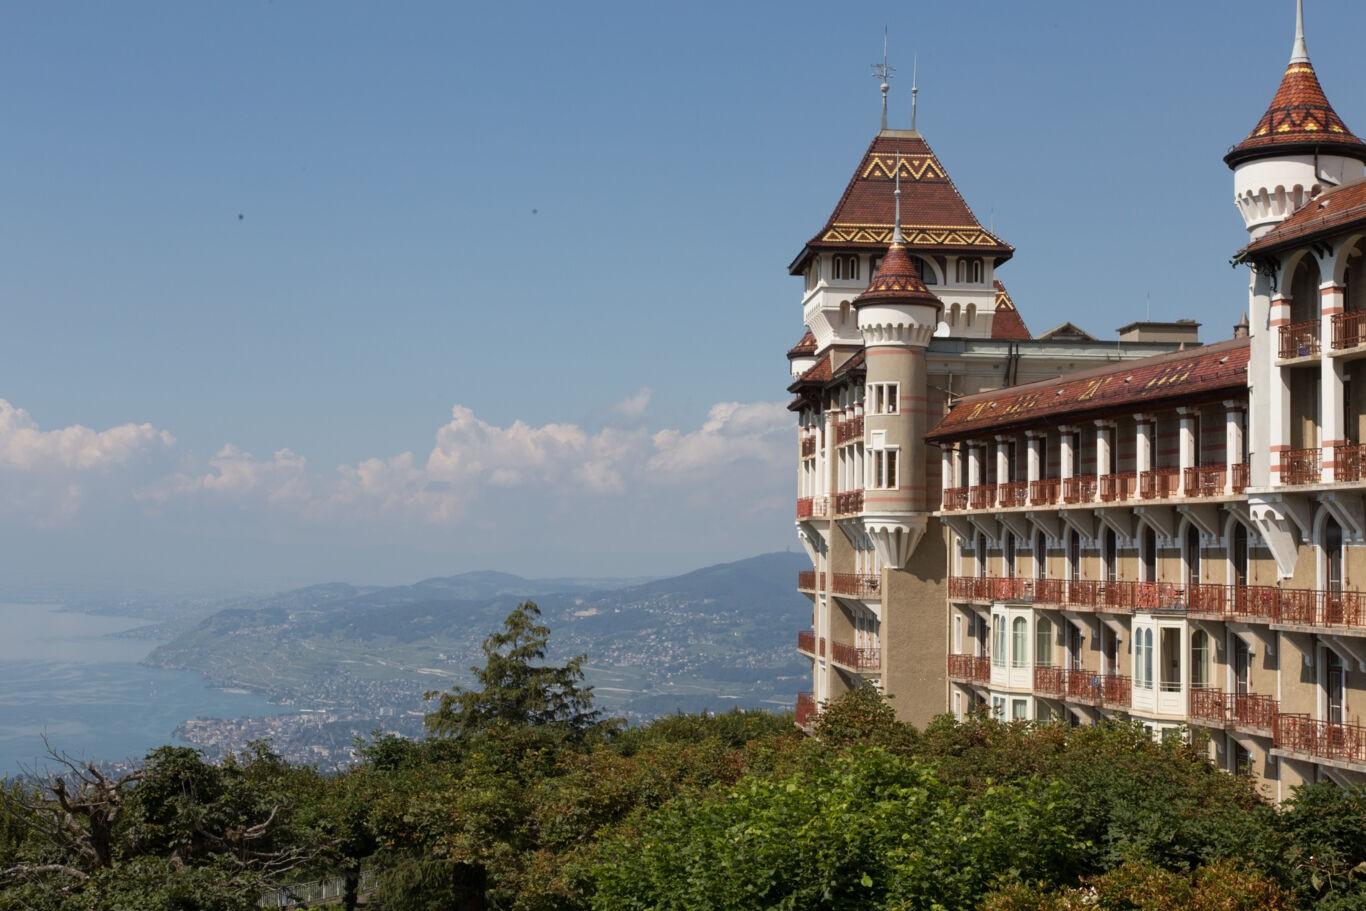 SHMS caux palace view